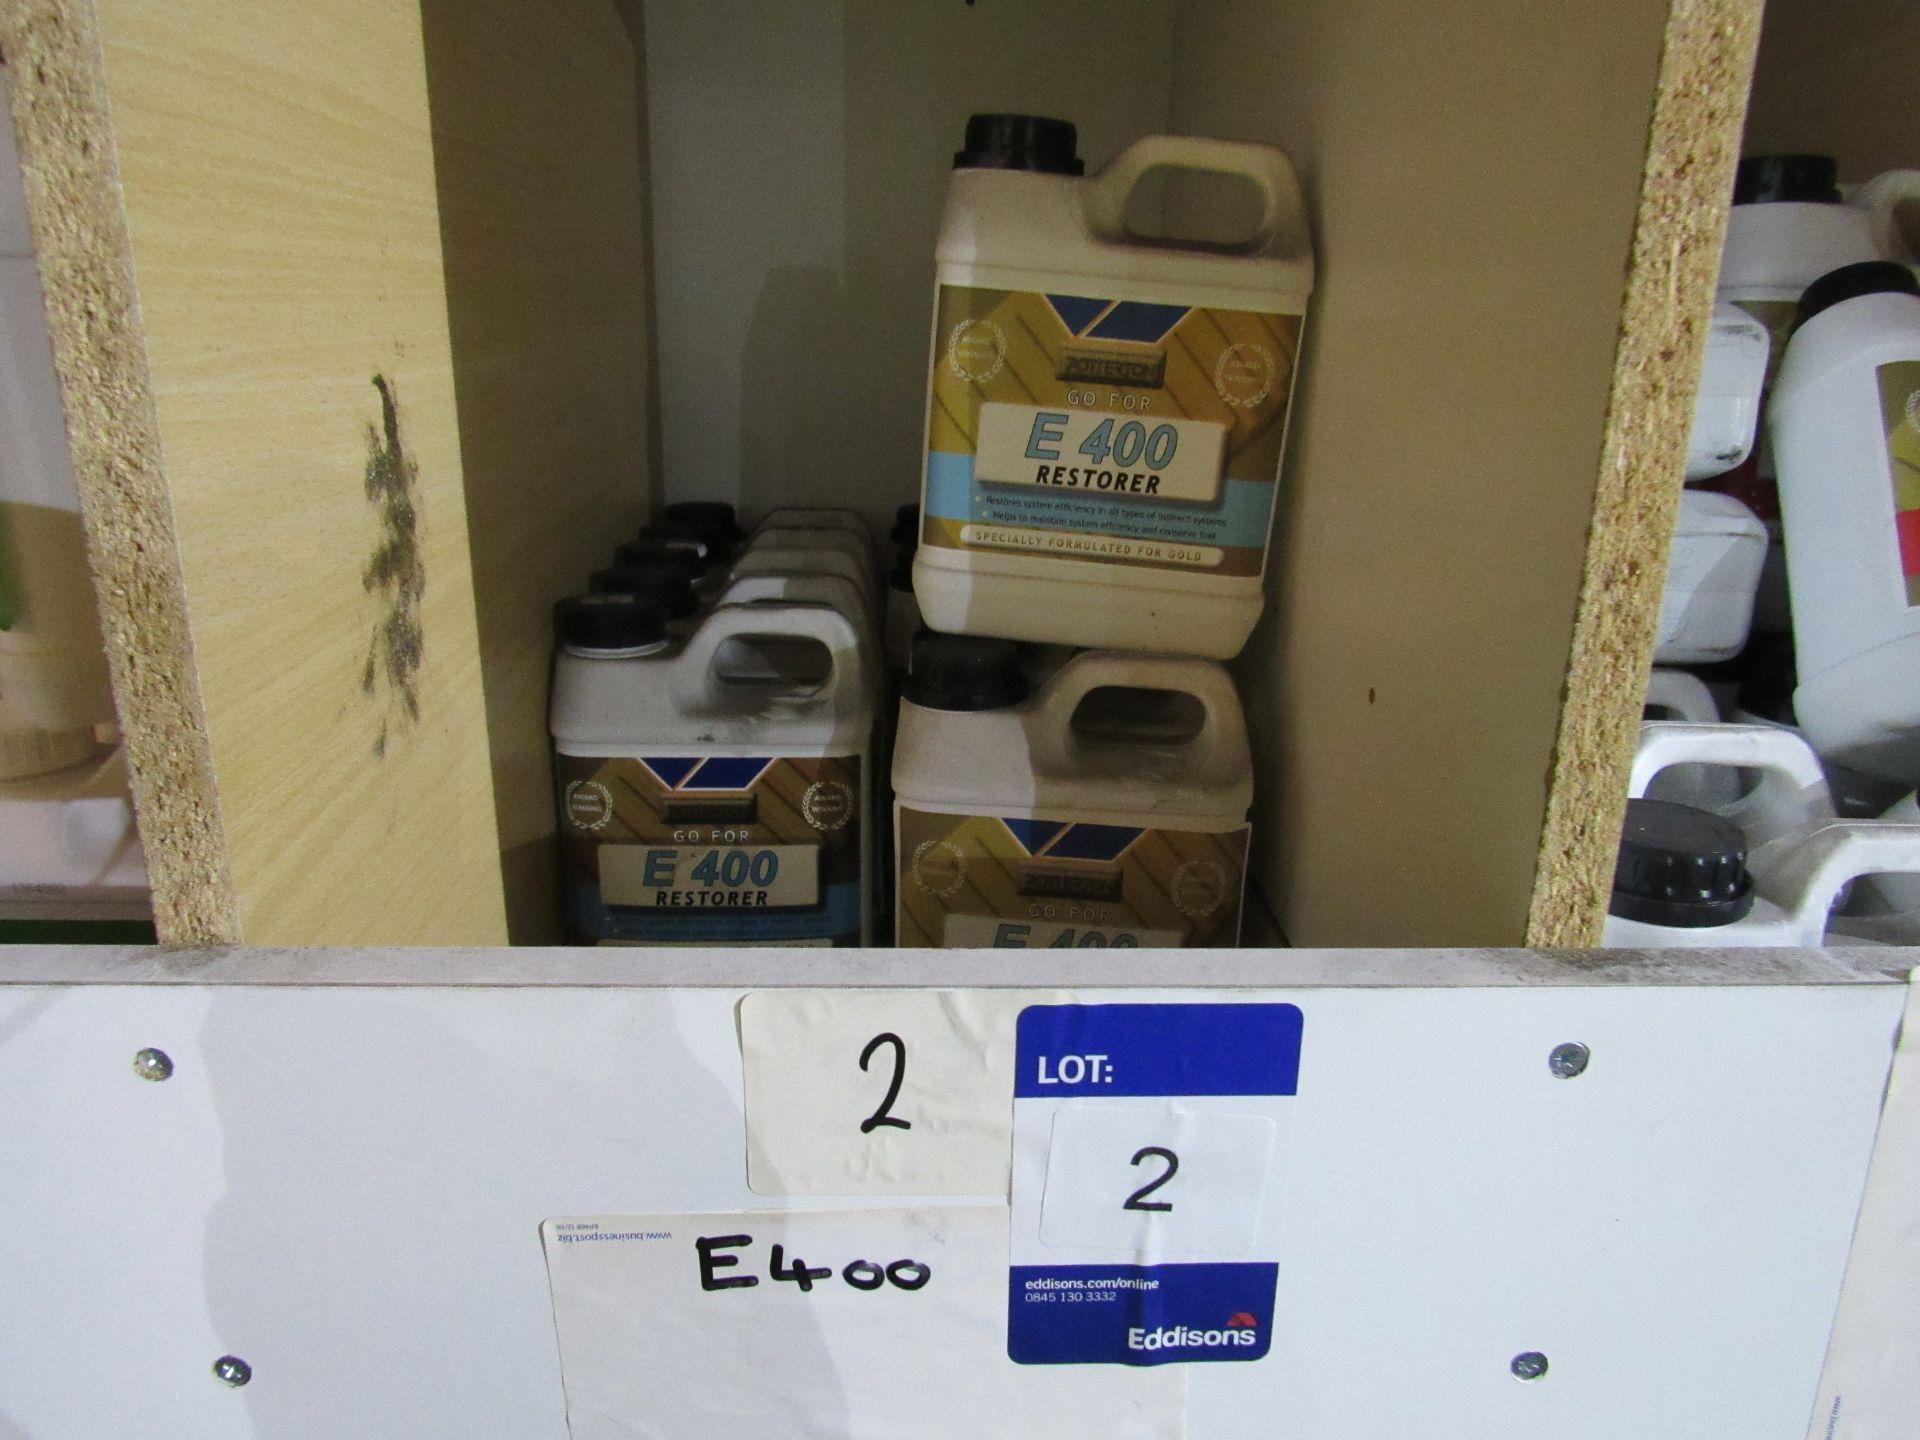 Lot 2 - 120 E400 Central Heating System Restorer - 1 Litre